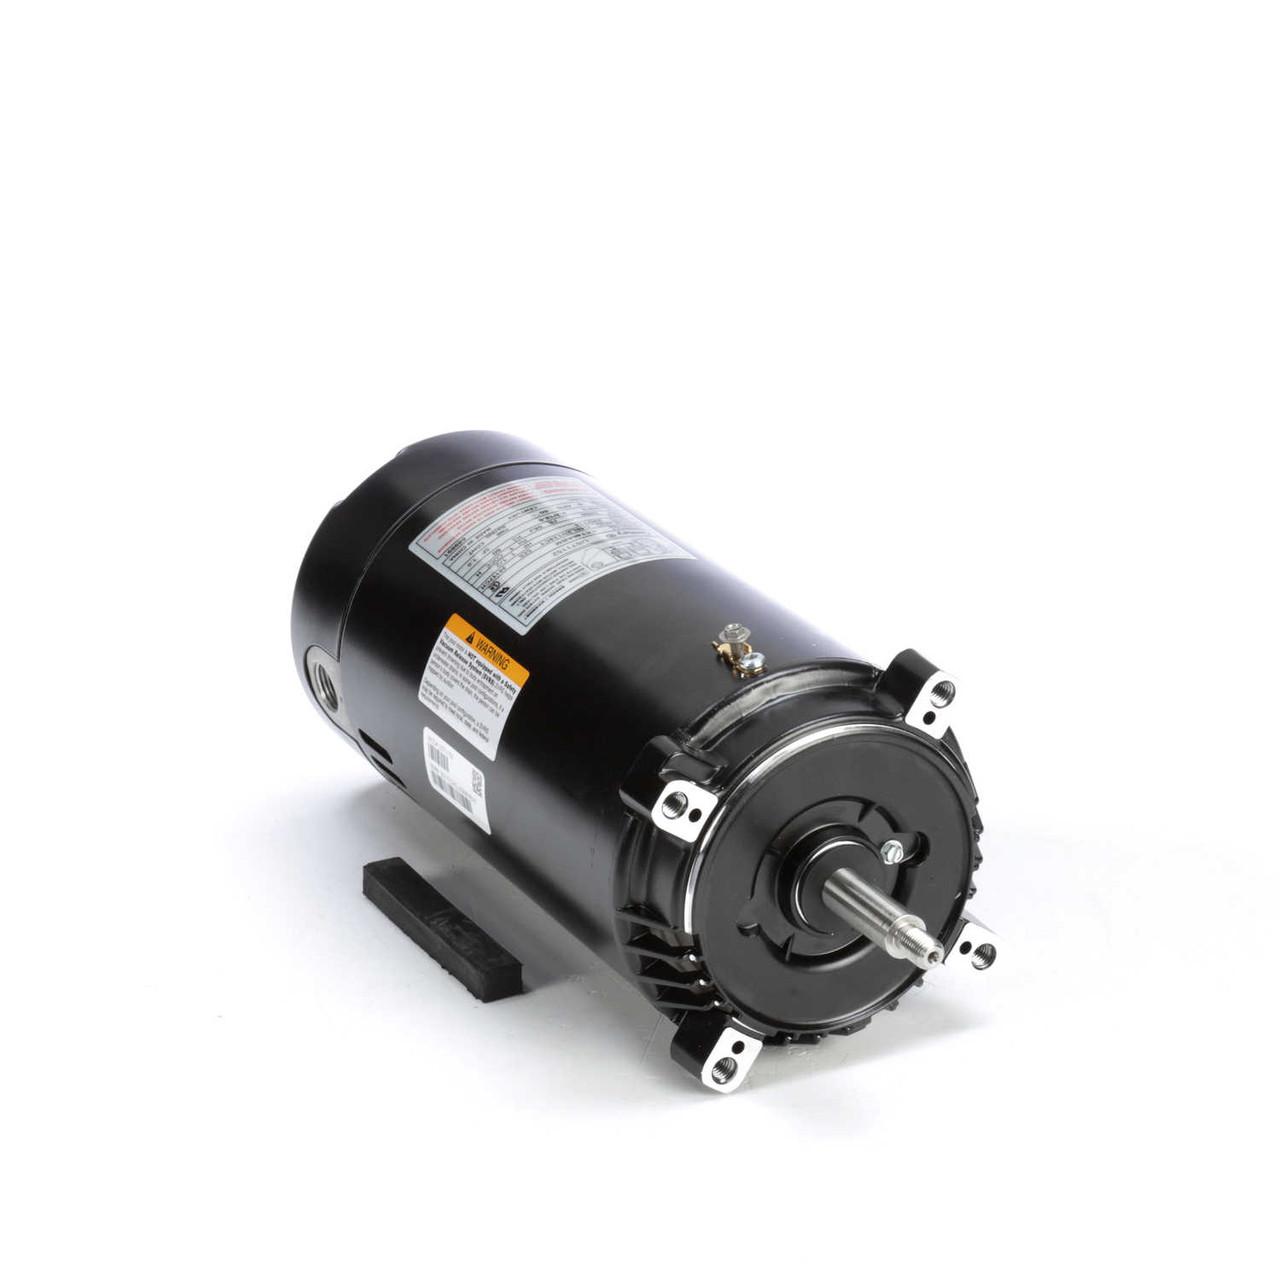 UST40 Century 40 40/40 hp 40 RPM 40J 40405/4030V Swimming Pool Pump Motor    Century  UST40